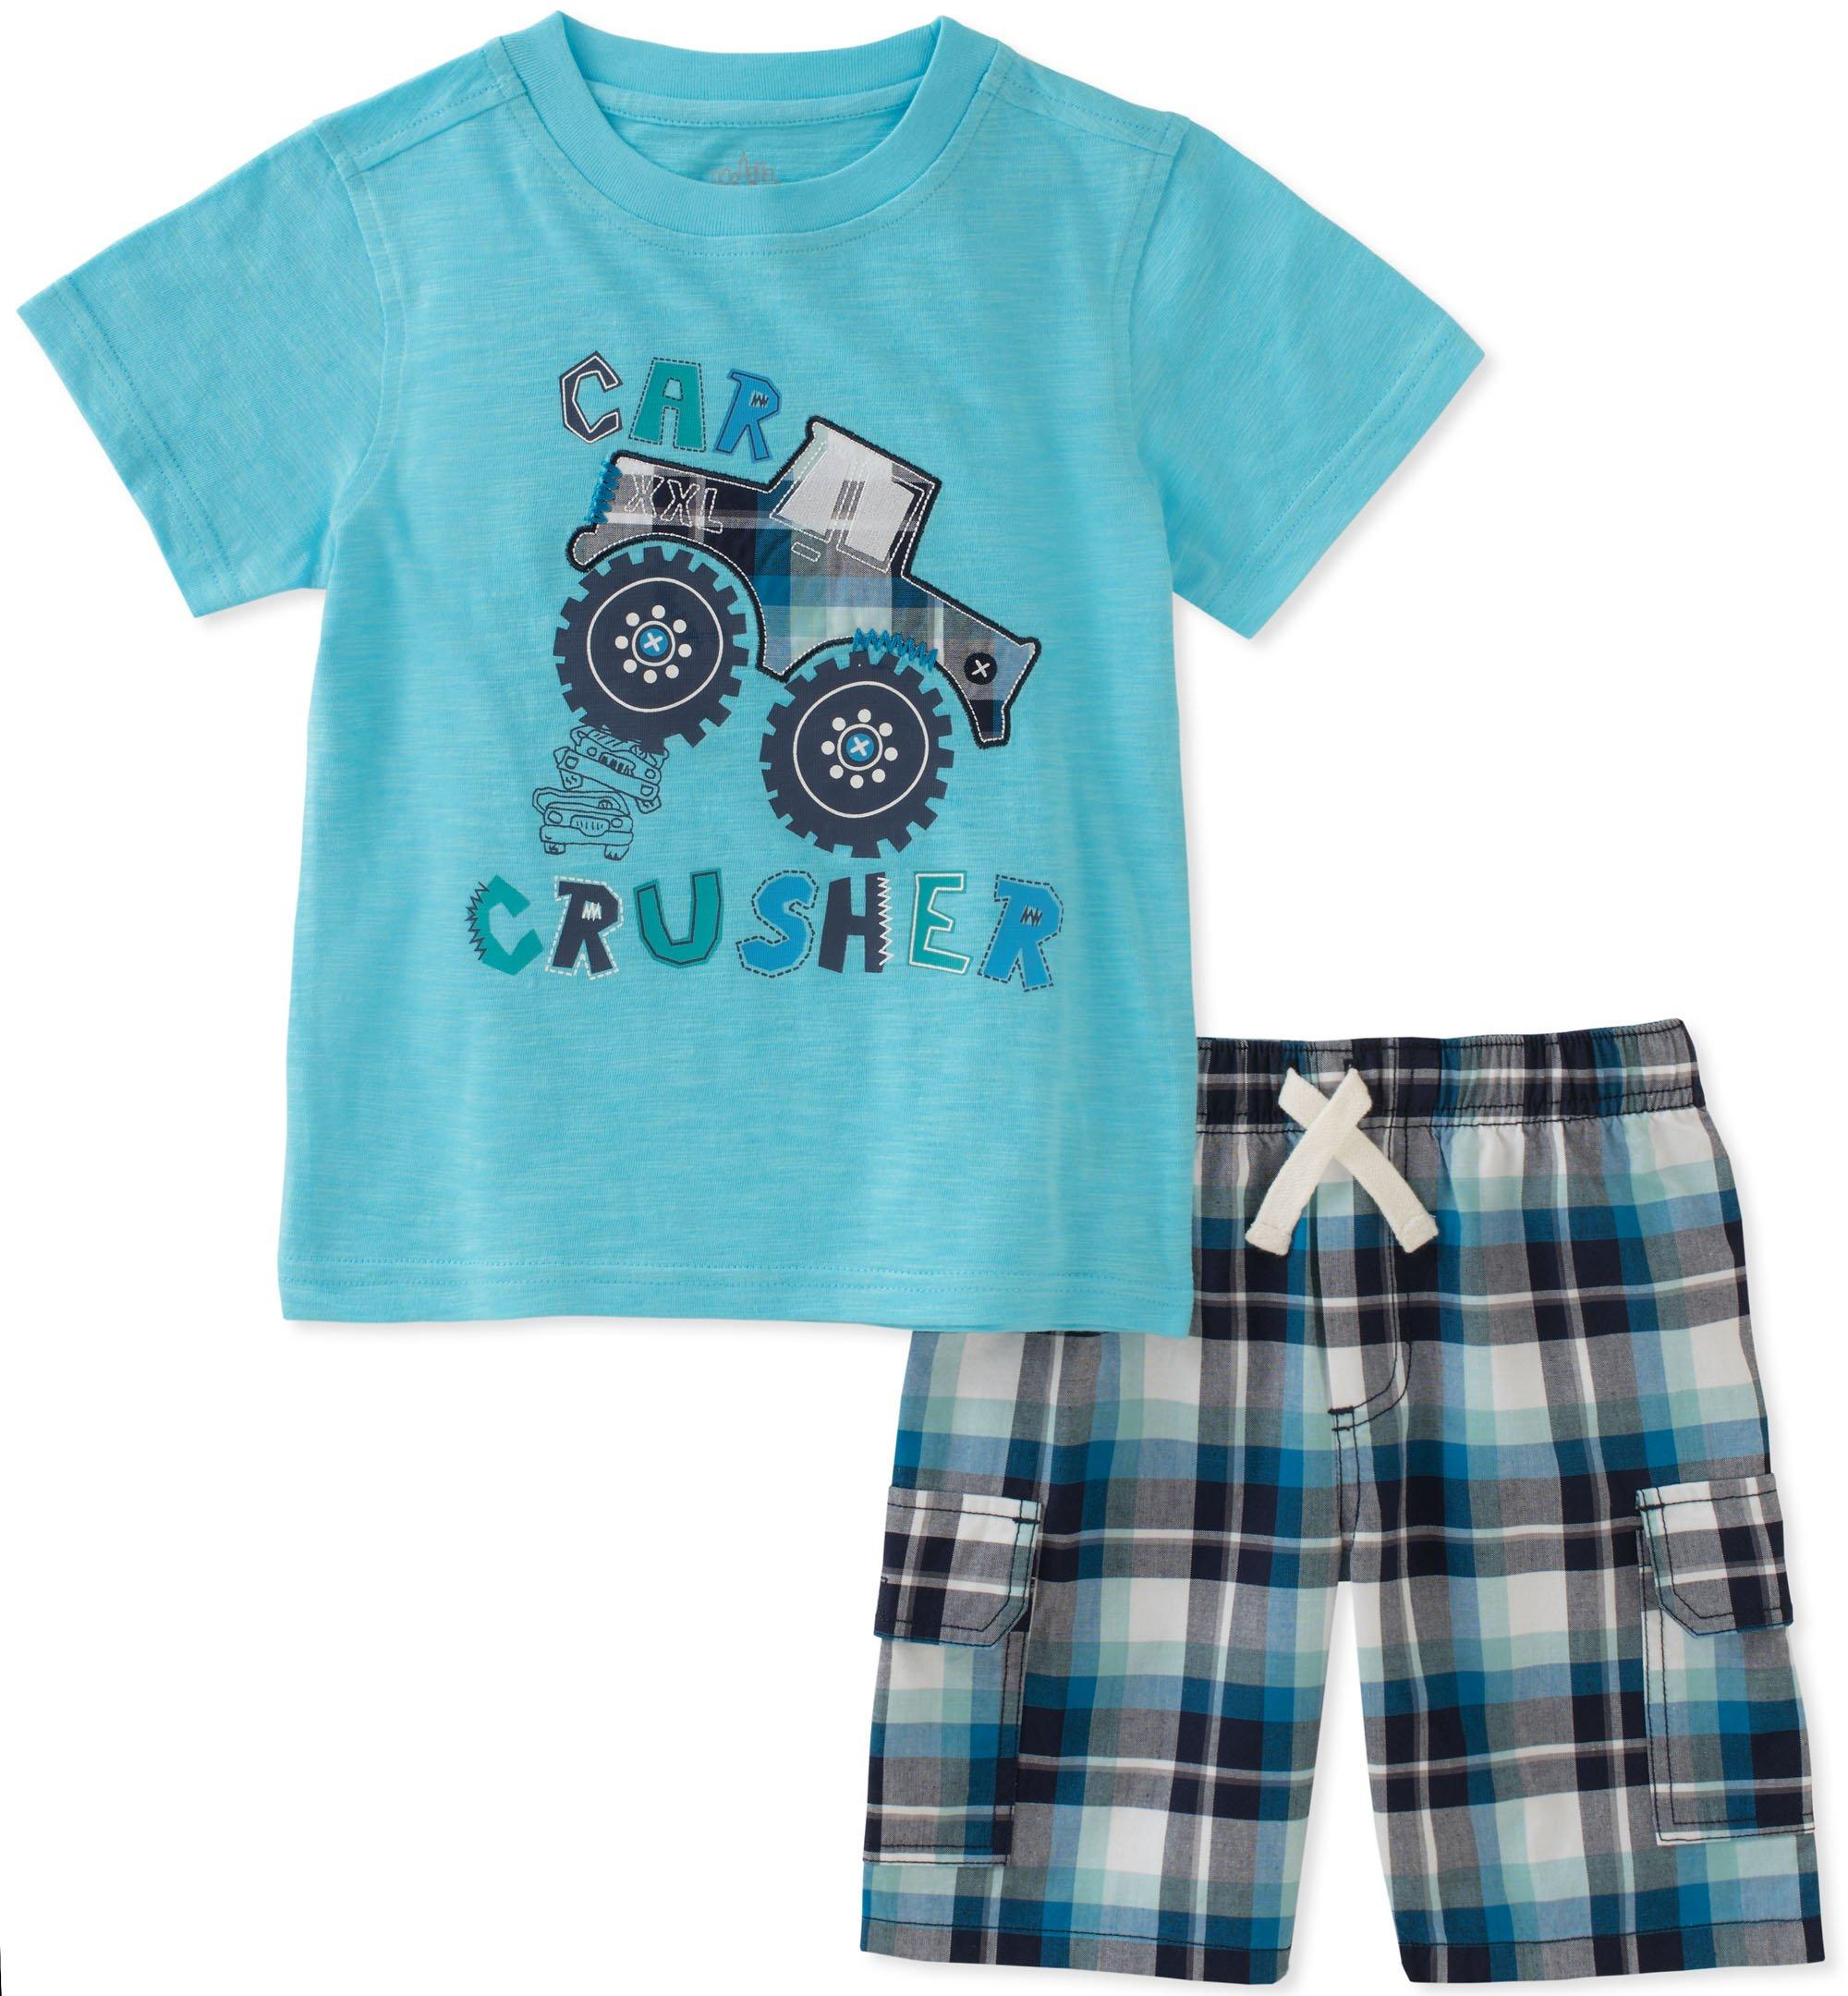 Kids Headquarters Boys' Toddler 2 Pieces Short Set, Blue/Green/Gray, 3T